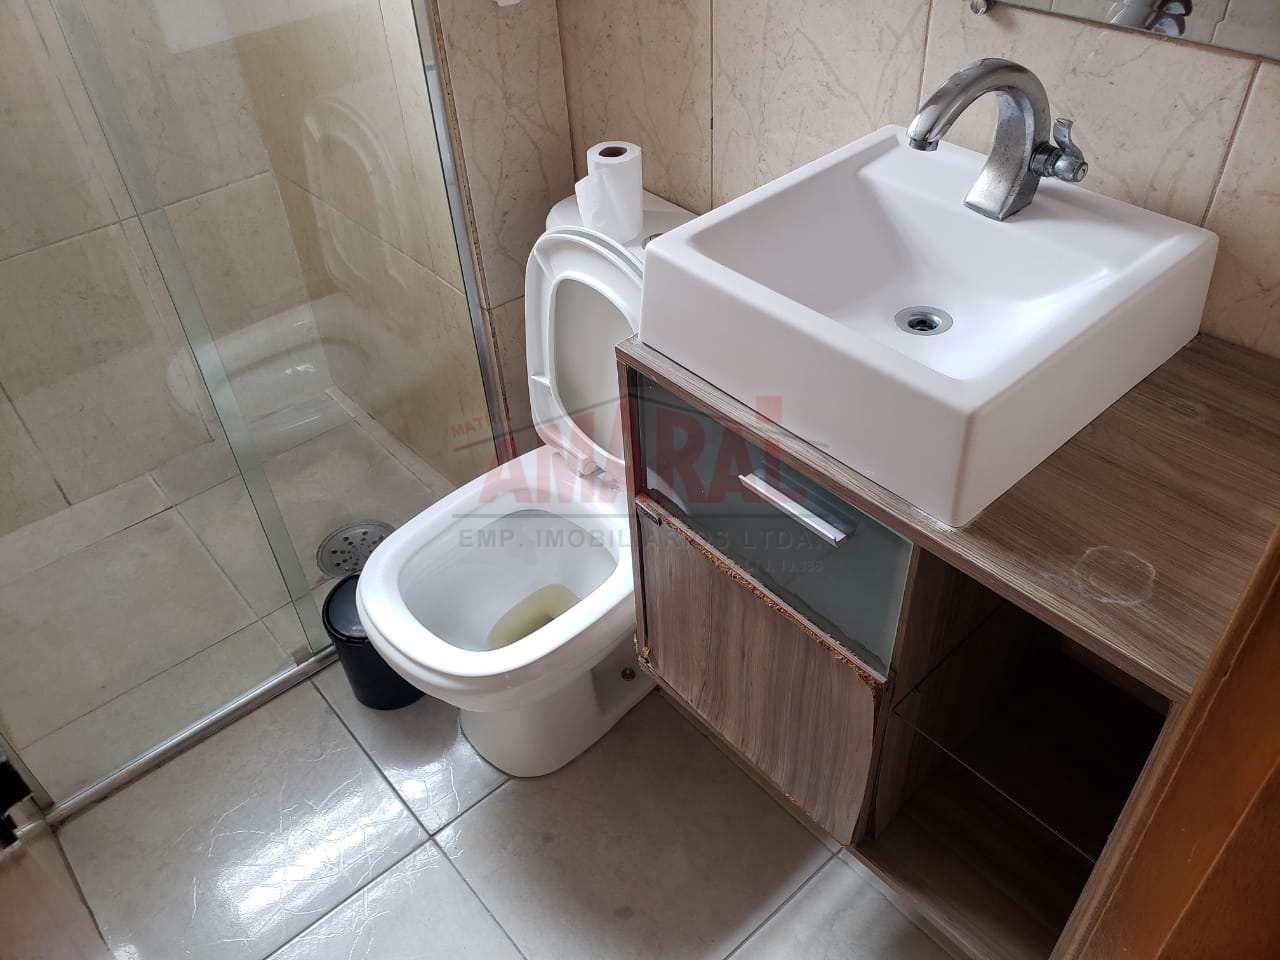 Apartamento com 2 dorms, Cidade Satélite Santa Bárbara, São Paulo - R$ 195 mil, Cod: 11347